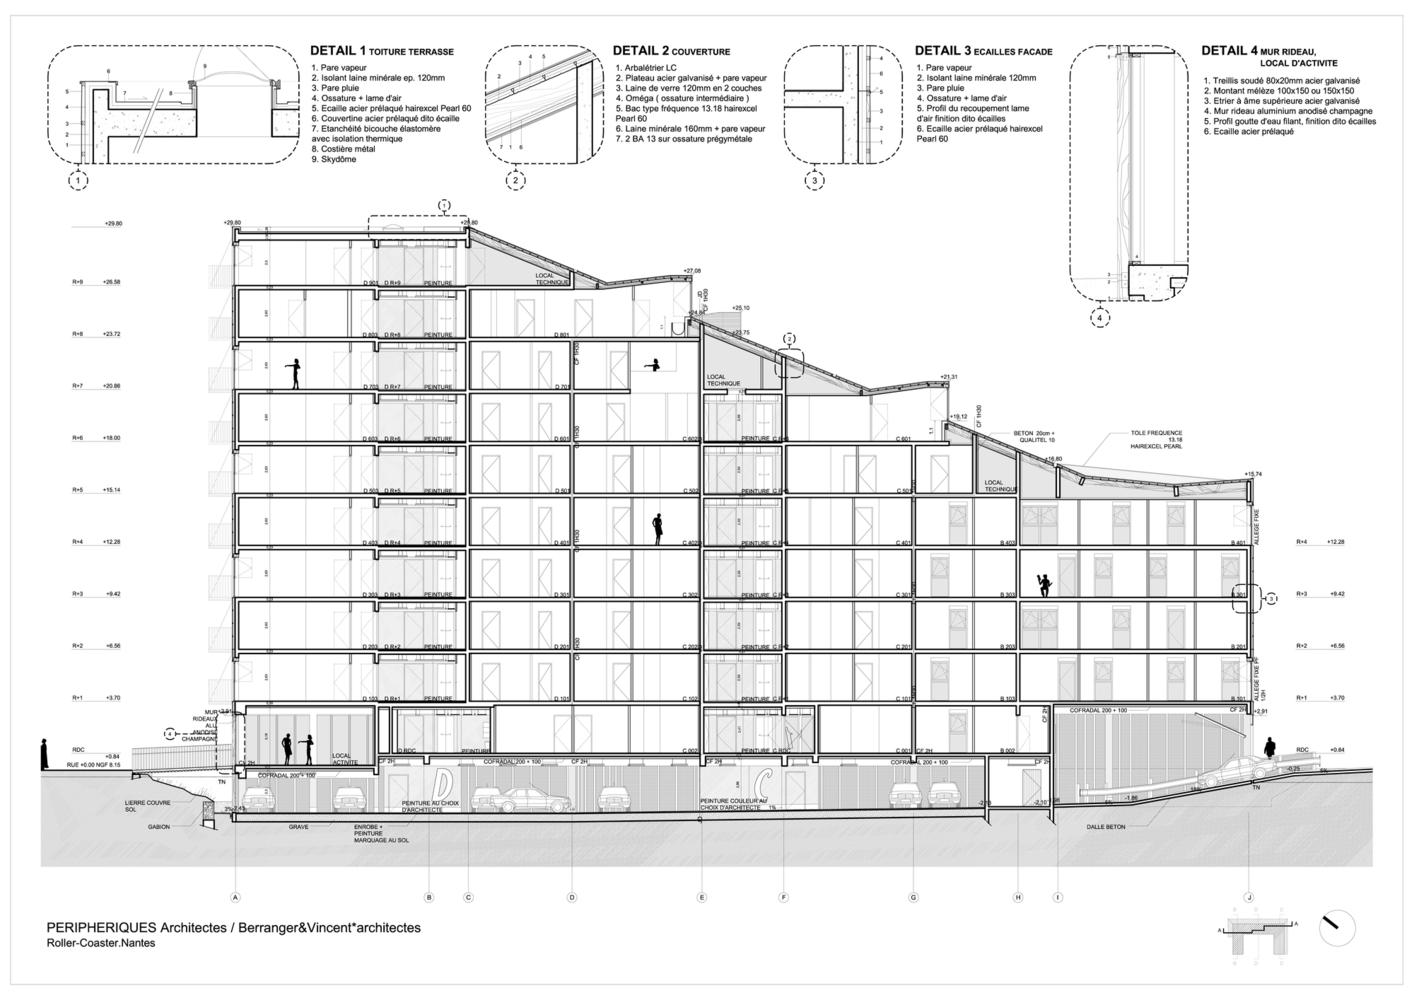 Gallery Of Roller Coaster Peripheriques Architectes 36